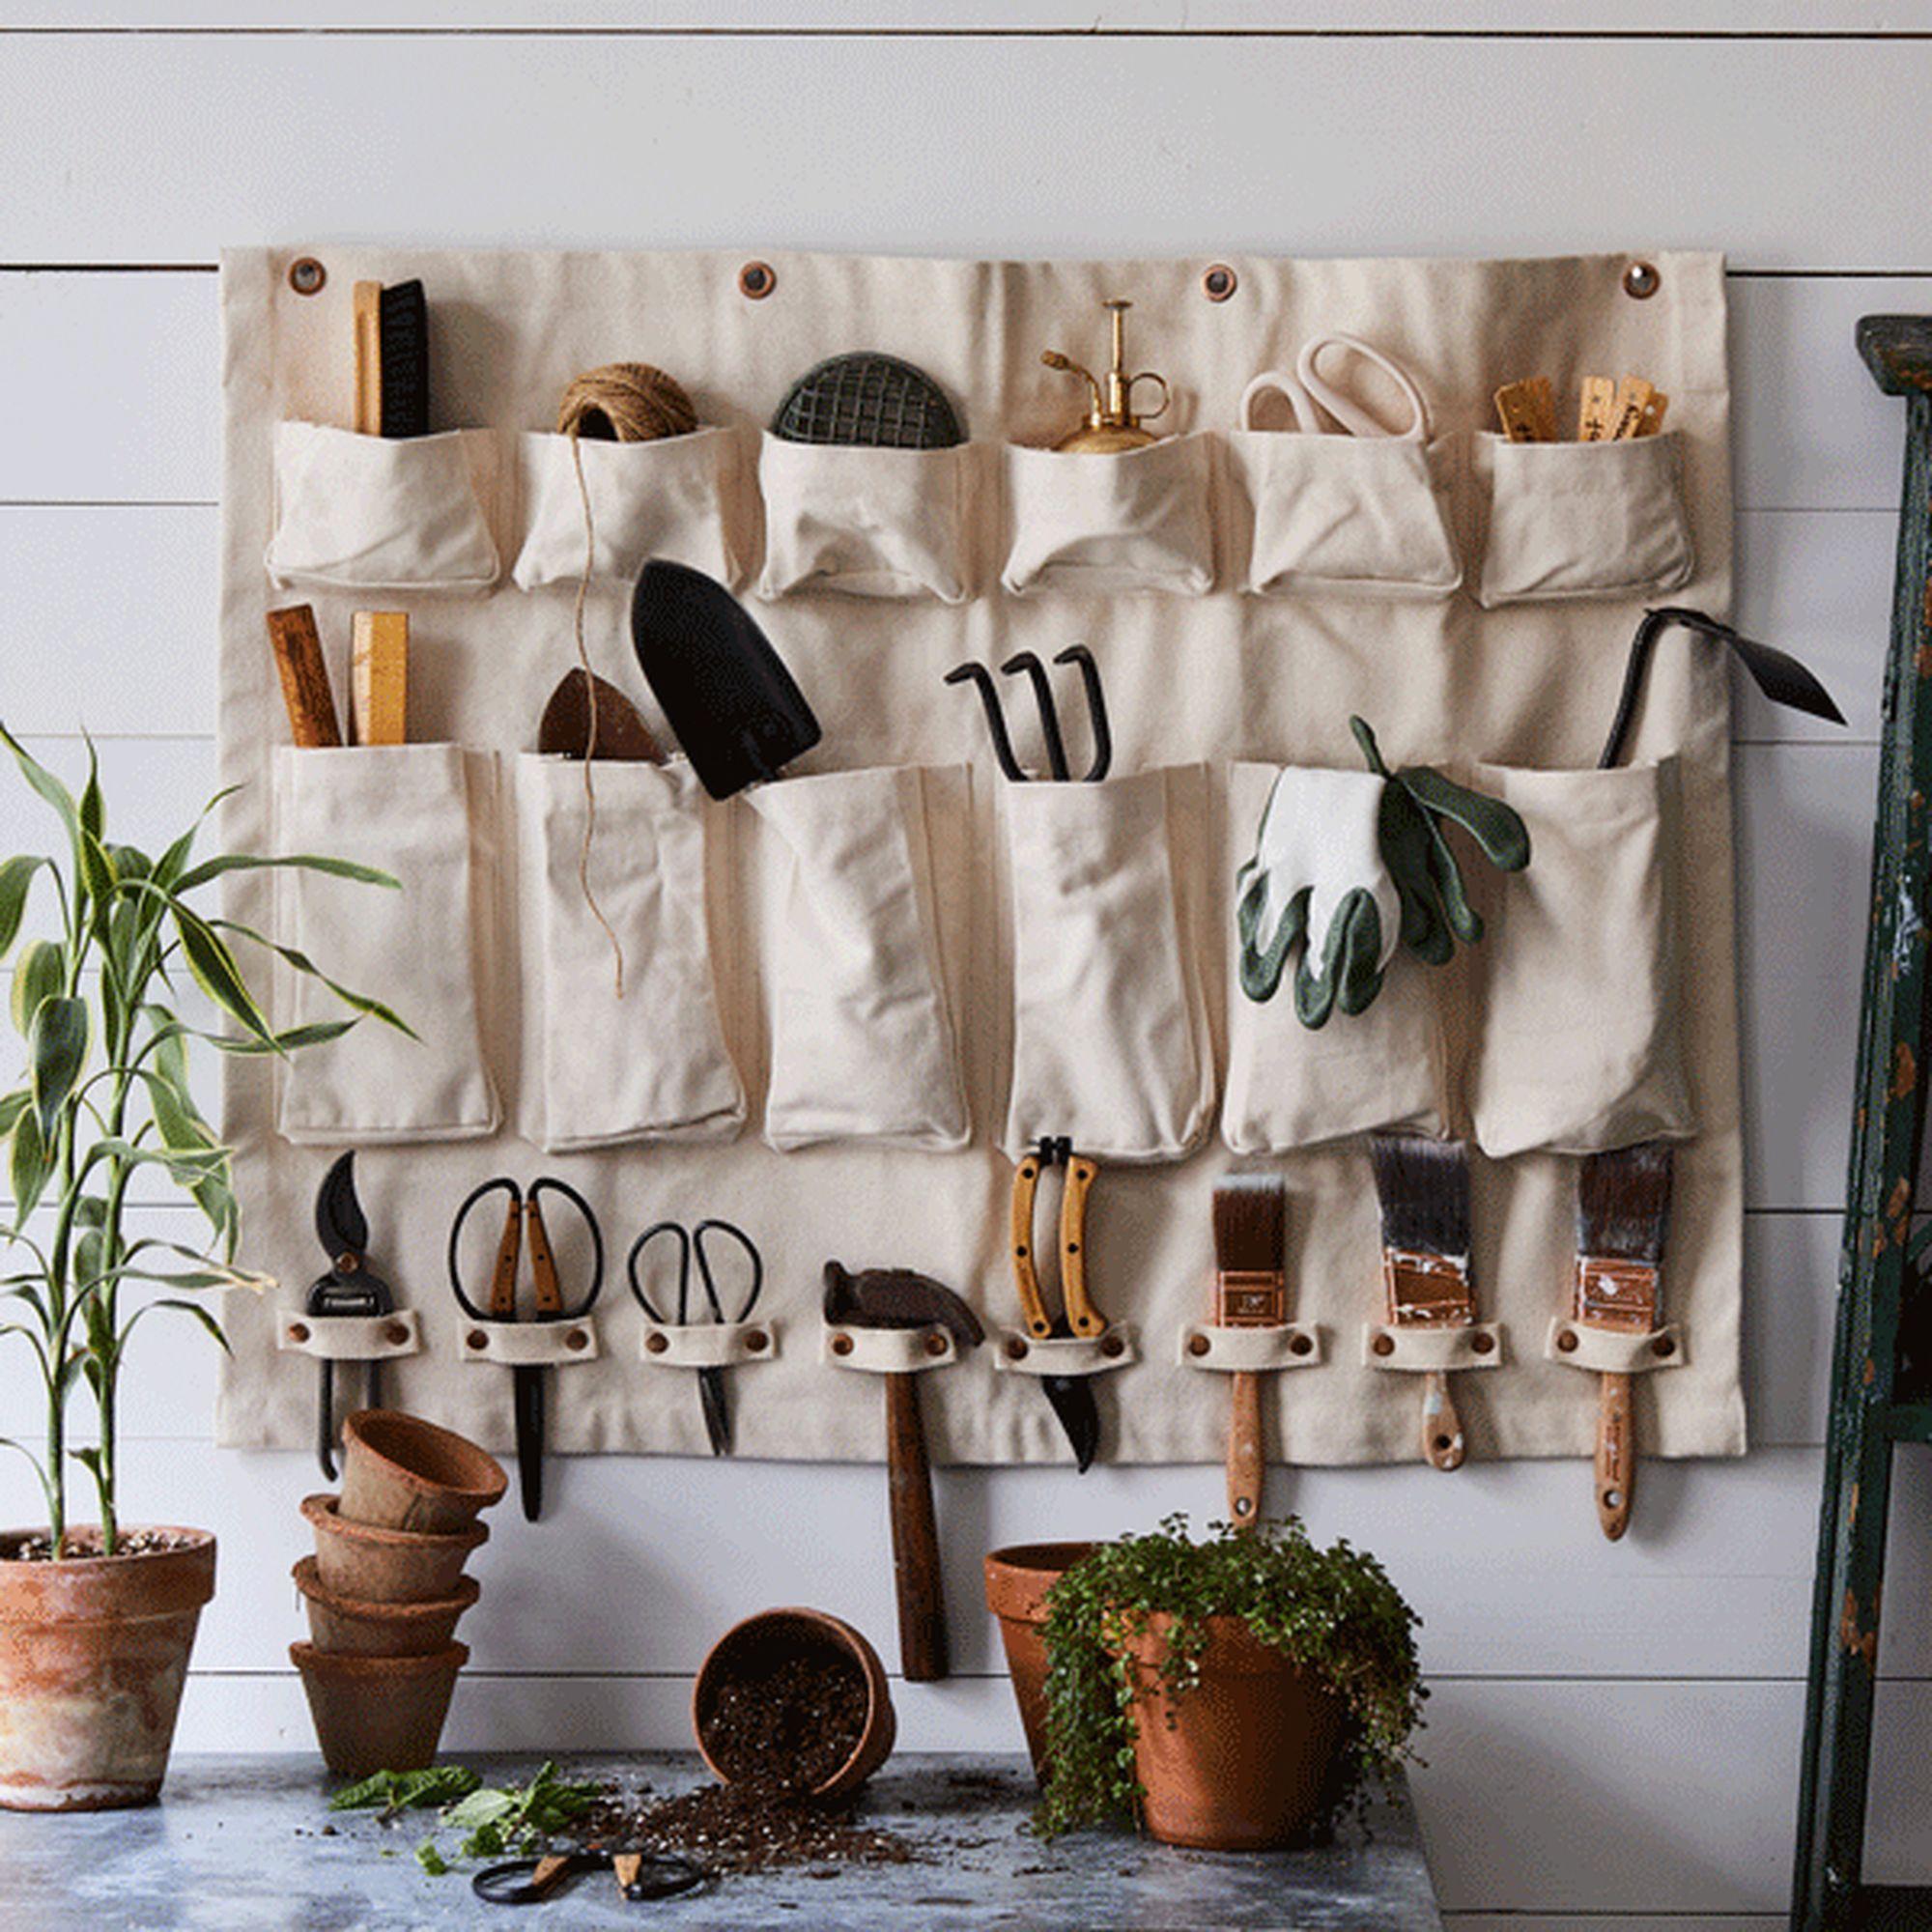 spring gardening 14 wall organizer